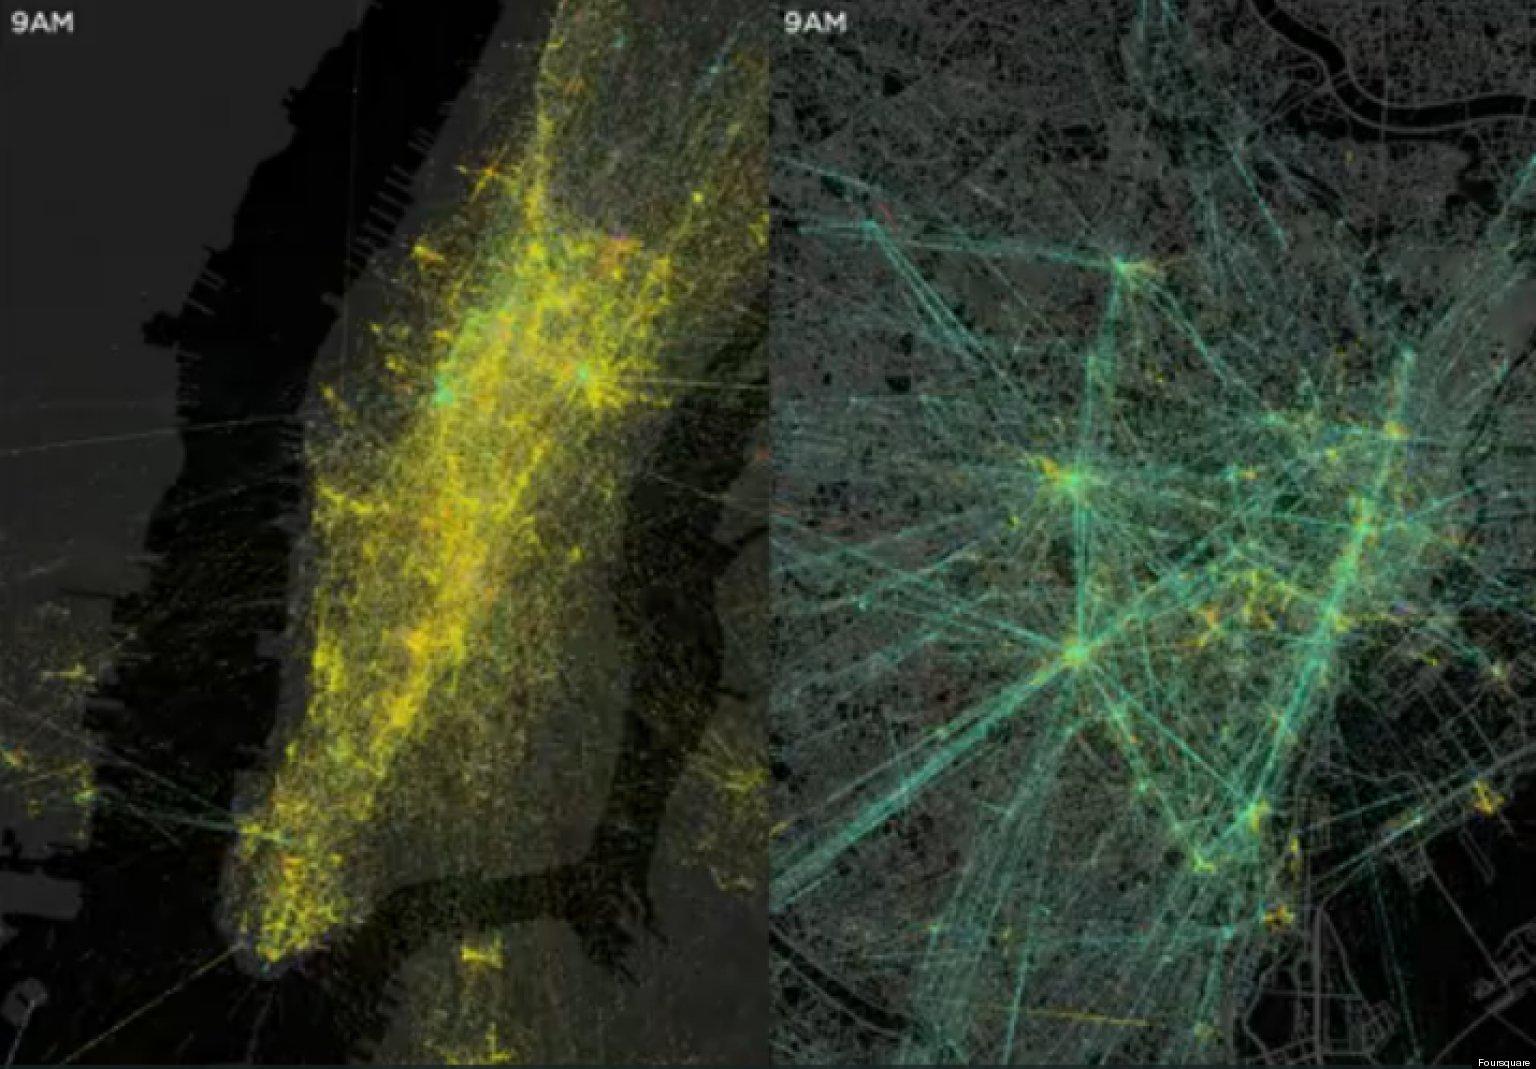 Foursquare Visualization Mesmerizing Map Illustrates New York City Tokyo Check Ins Video